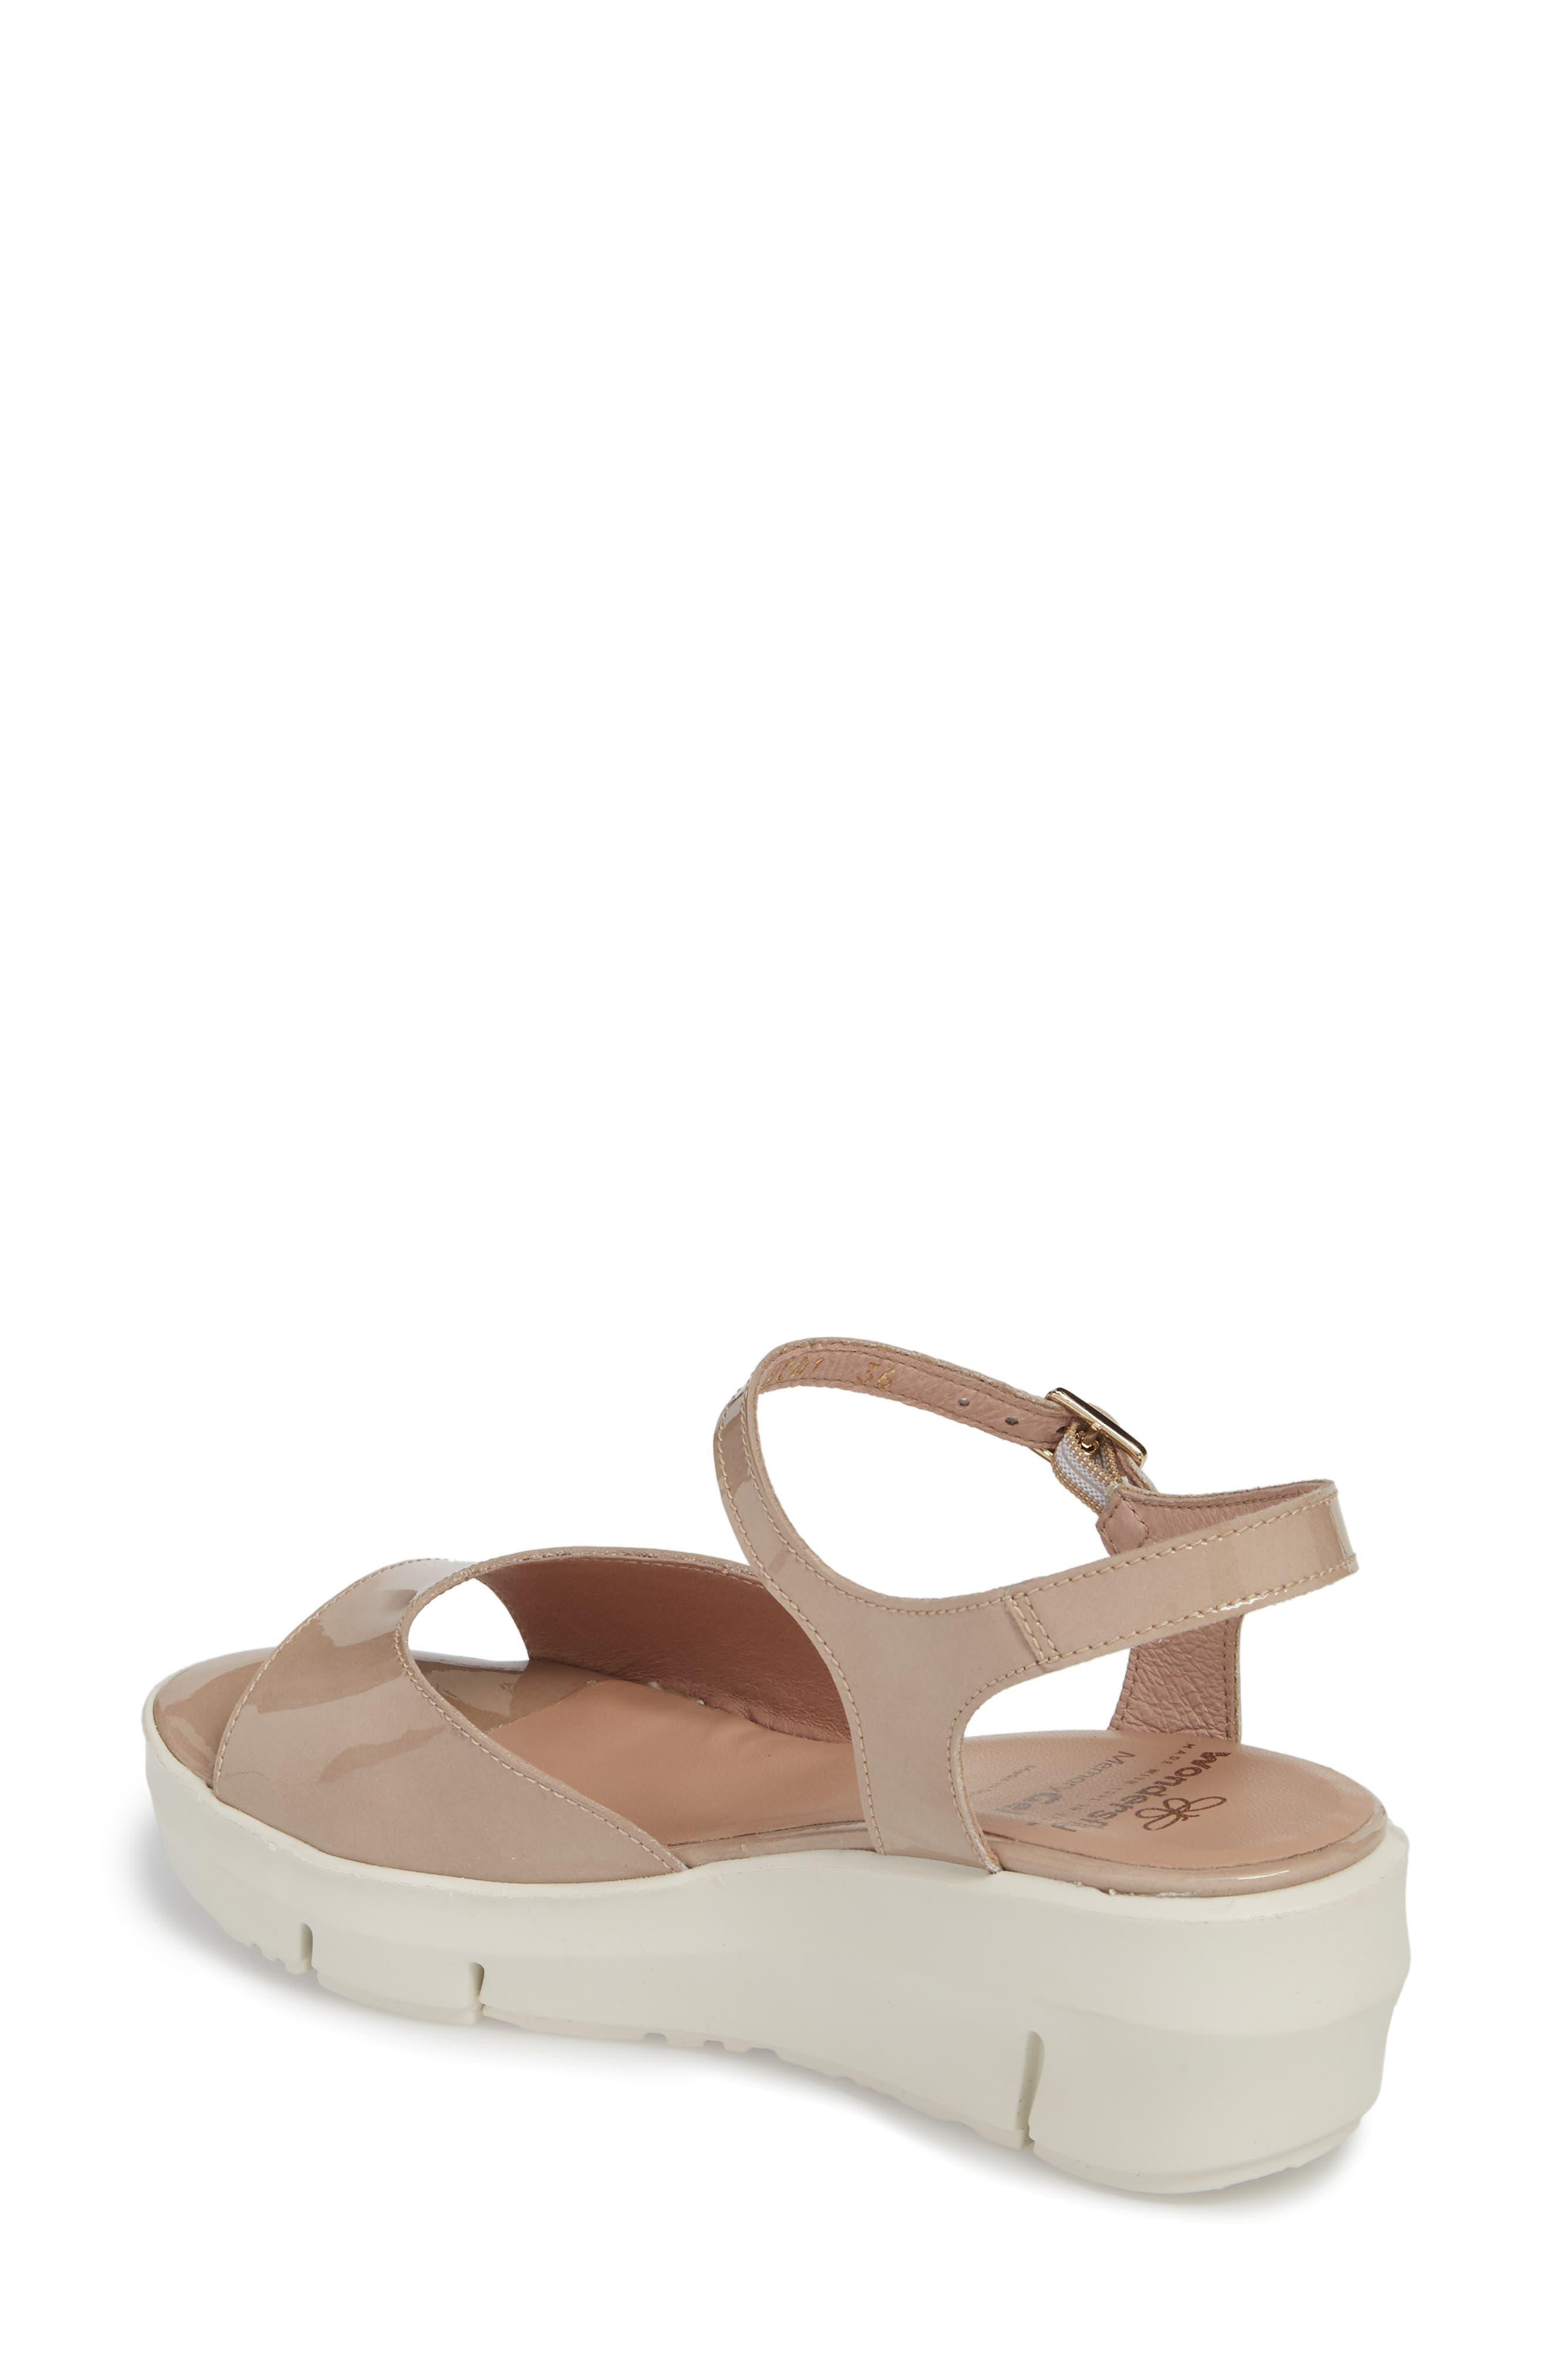 D-8201 Platform Sandal,                             Alternate thumbnail 2, color,                             Taupe Leather